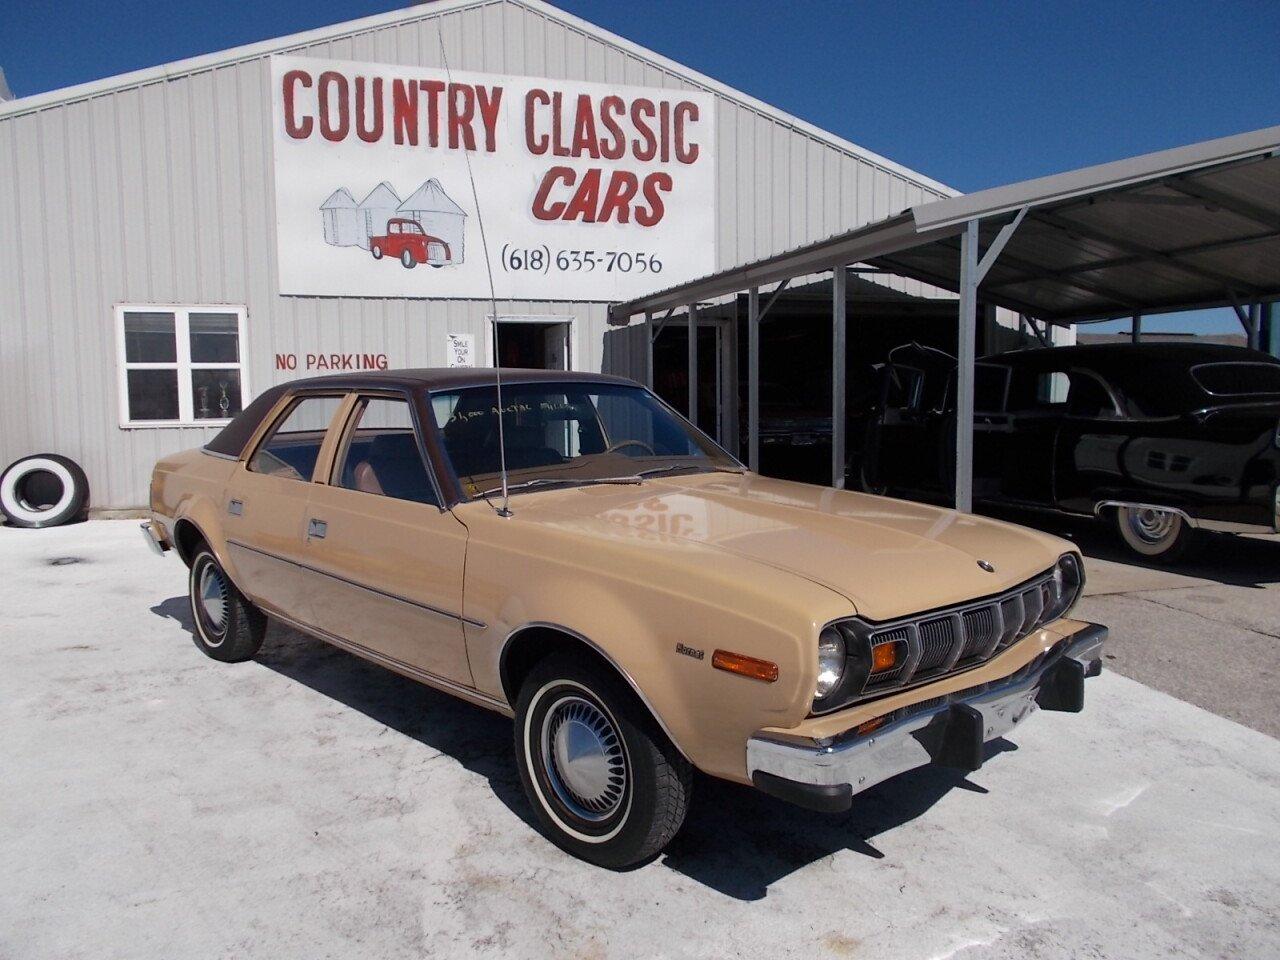 Classic Cars For Sale Auto Trader Com: 1977 AMC Hornet For Sale Near Staunton, Illinois 62088